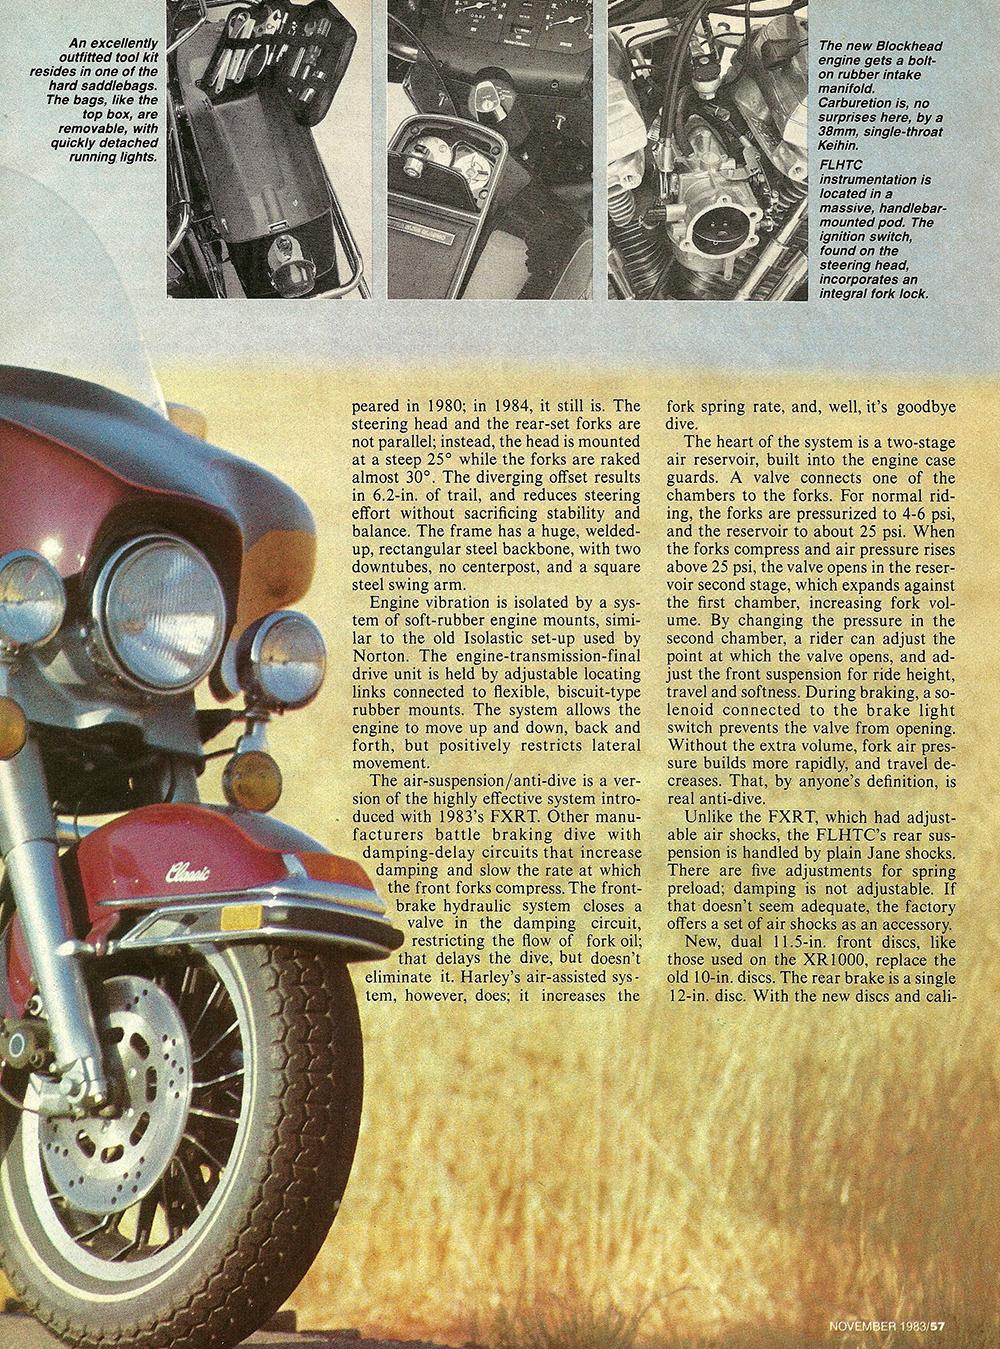 1983 Harley-Davidson FLHTC road test — Ye Olde Cycle Shoppe